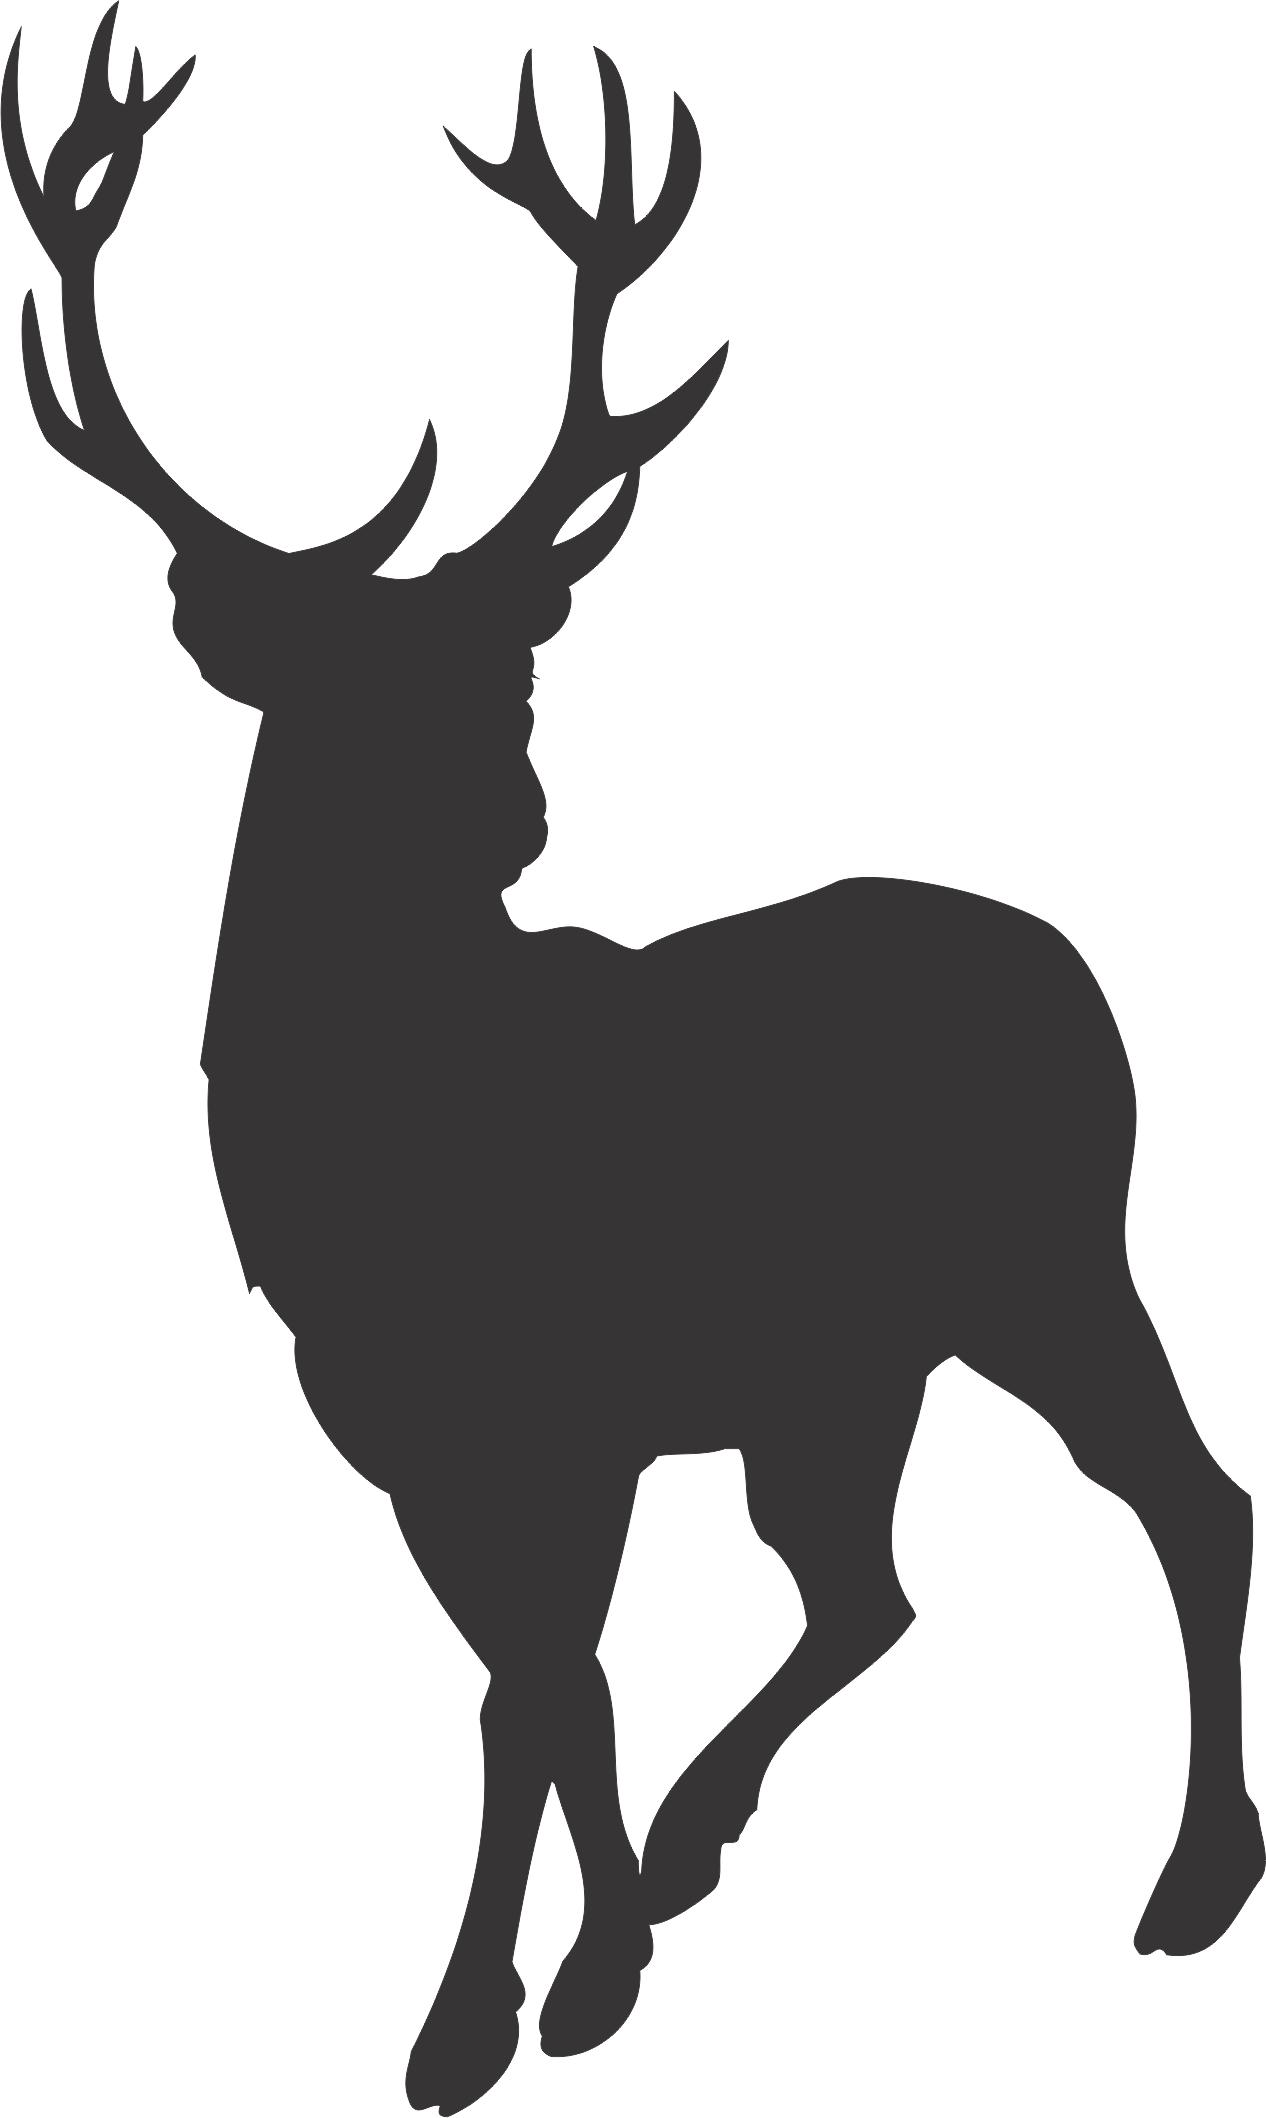 Free Deer Silhouette-Free Deer Silhouette-10